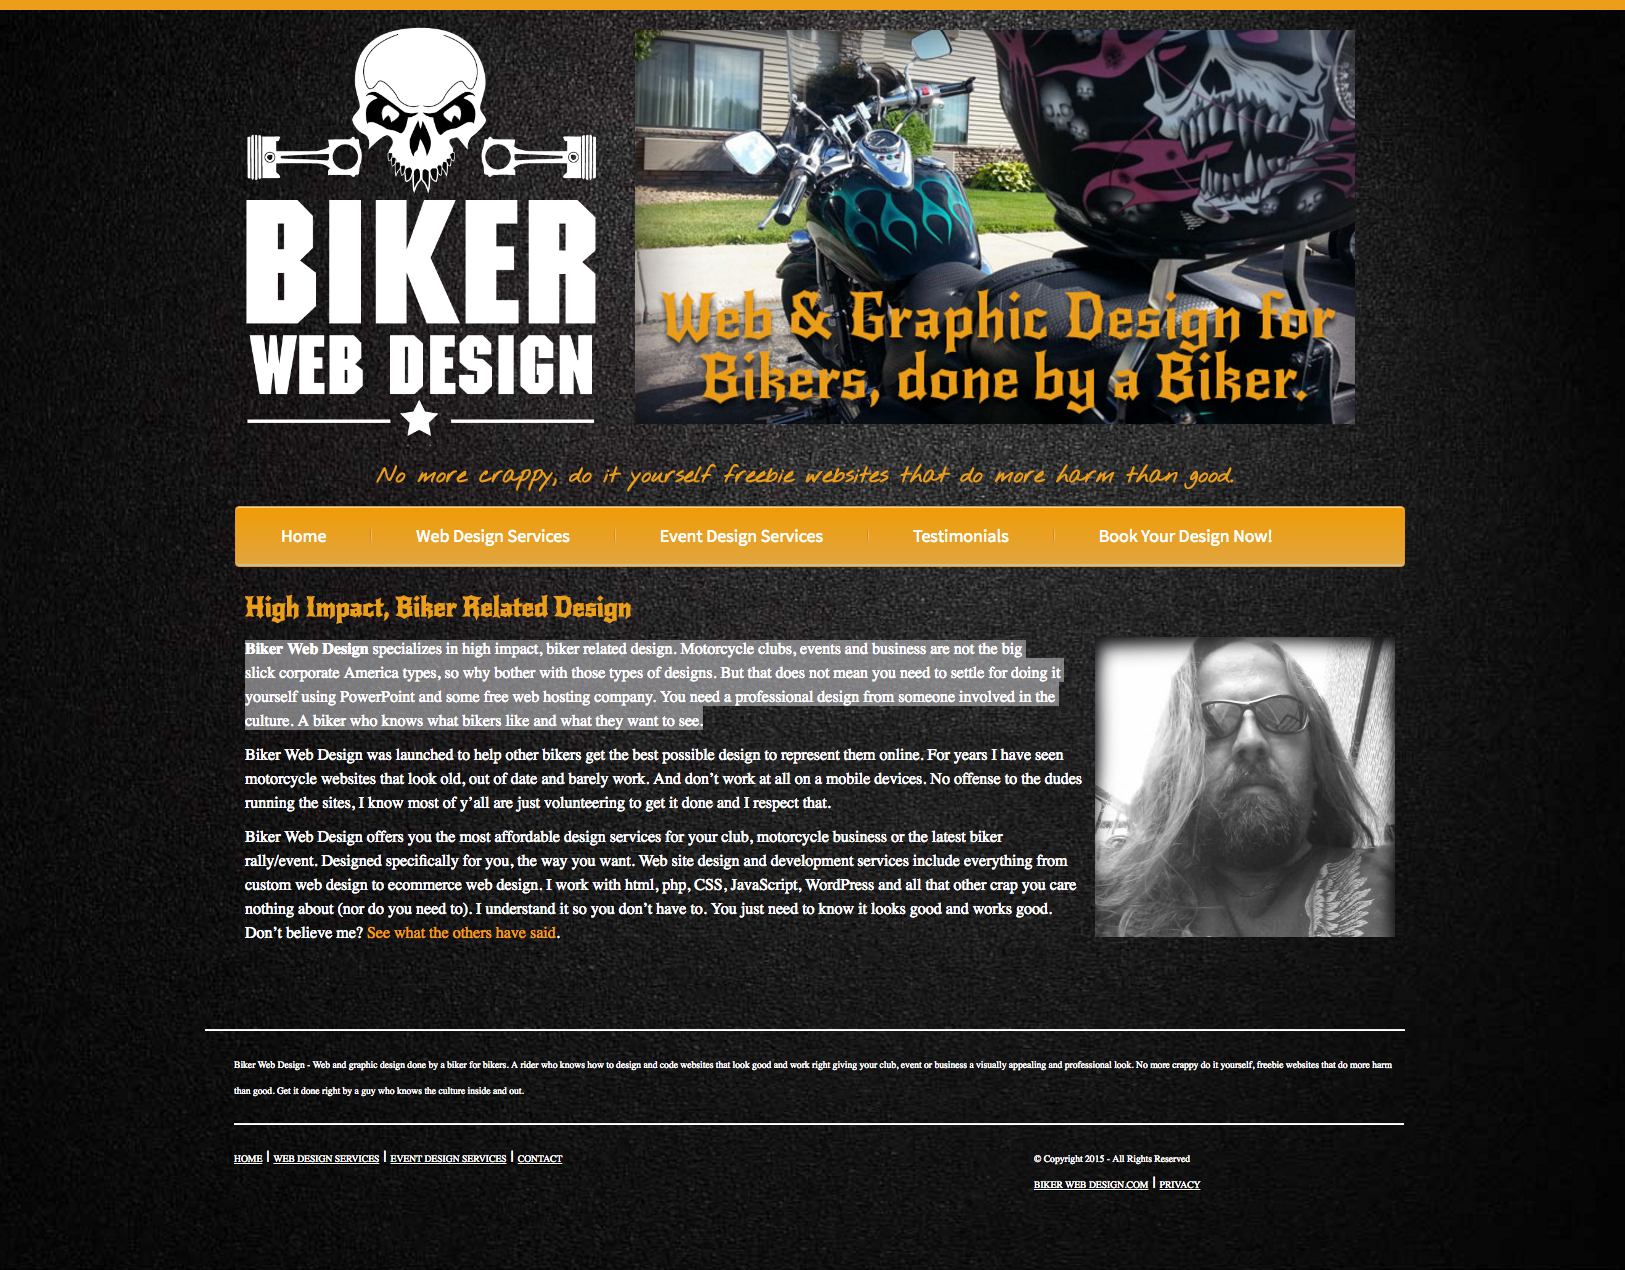 Biker web design creative compulsions screen shot 2016 05 18 at 21029 pm solutioingenieria Choice Image